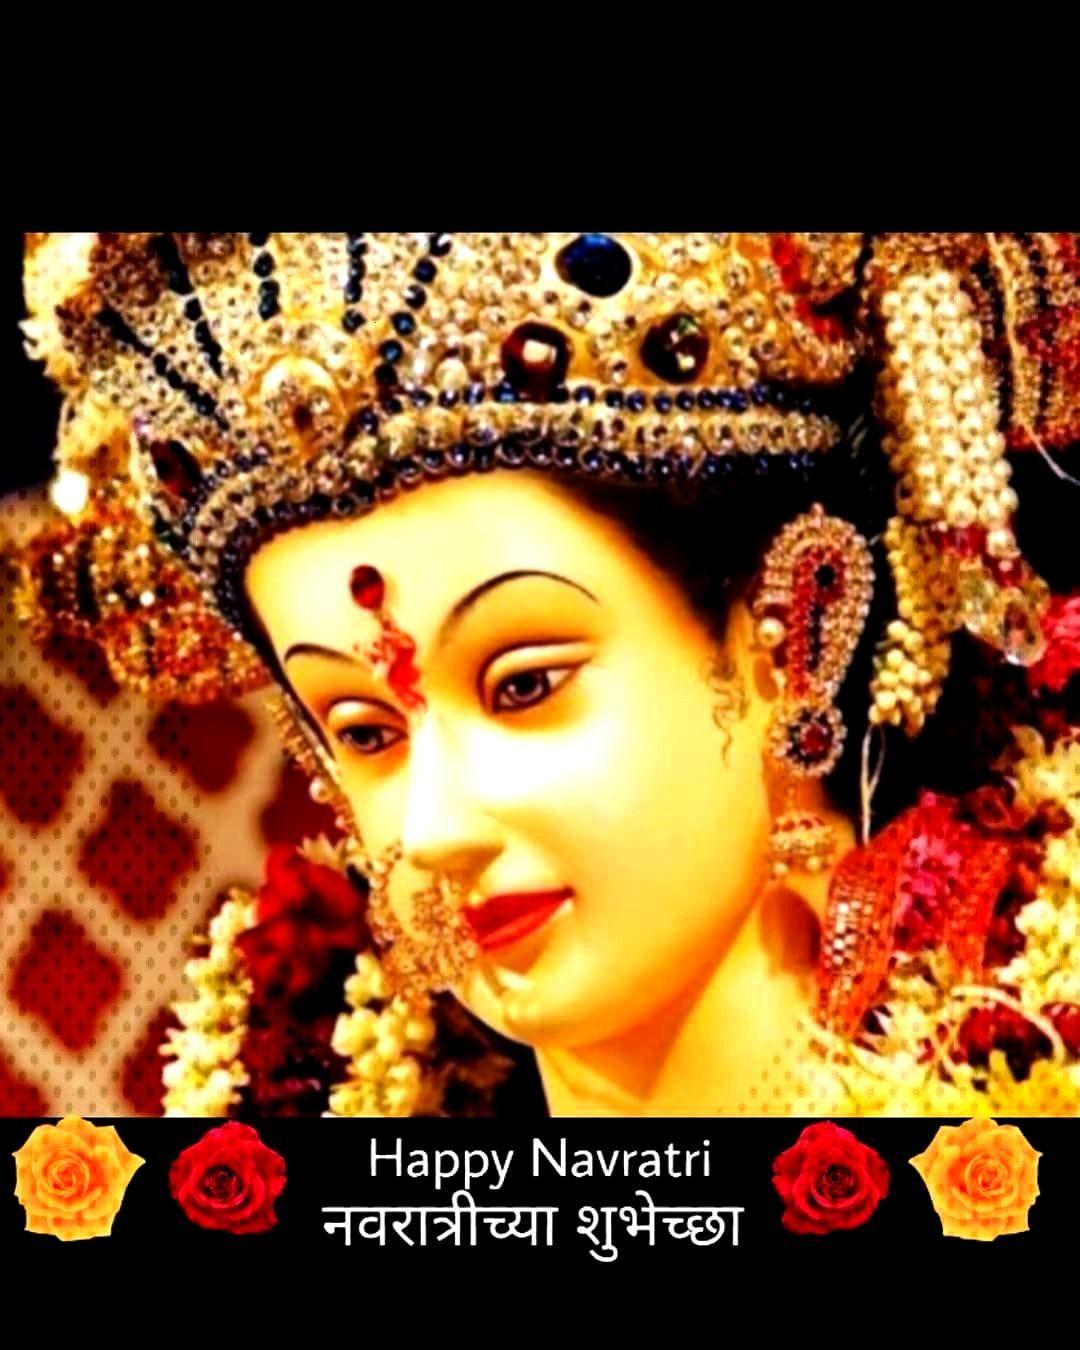 Wishing everyone . . . Wishing everyone . . . Wishing everyone . . . Wishing eve